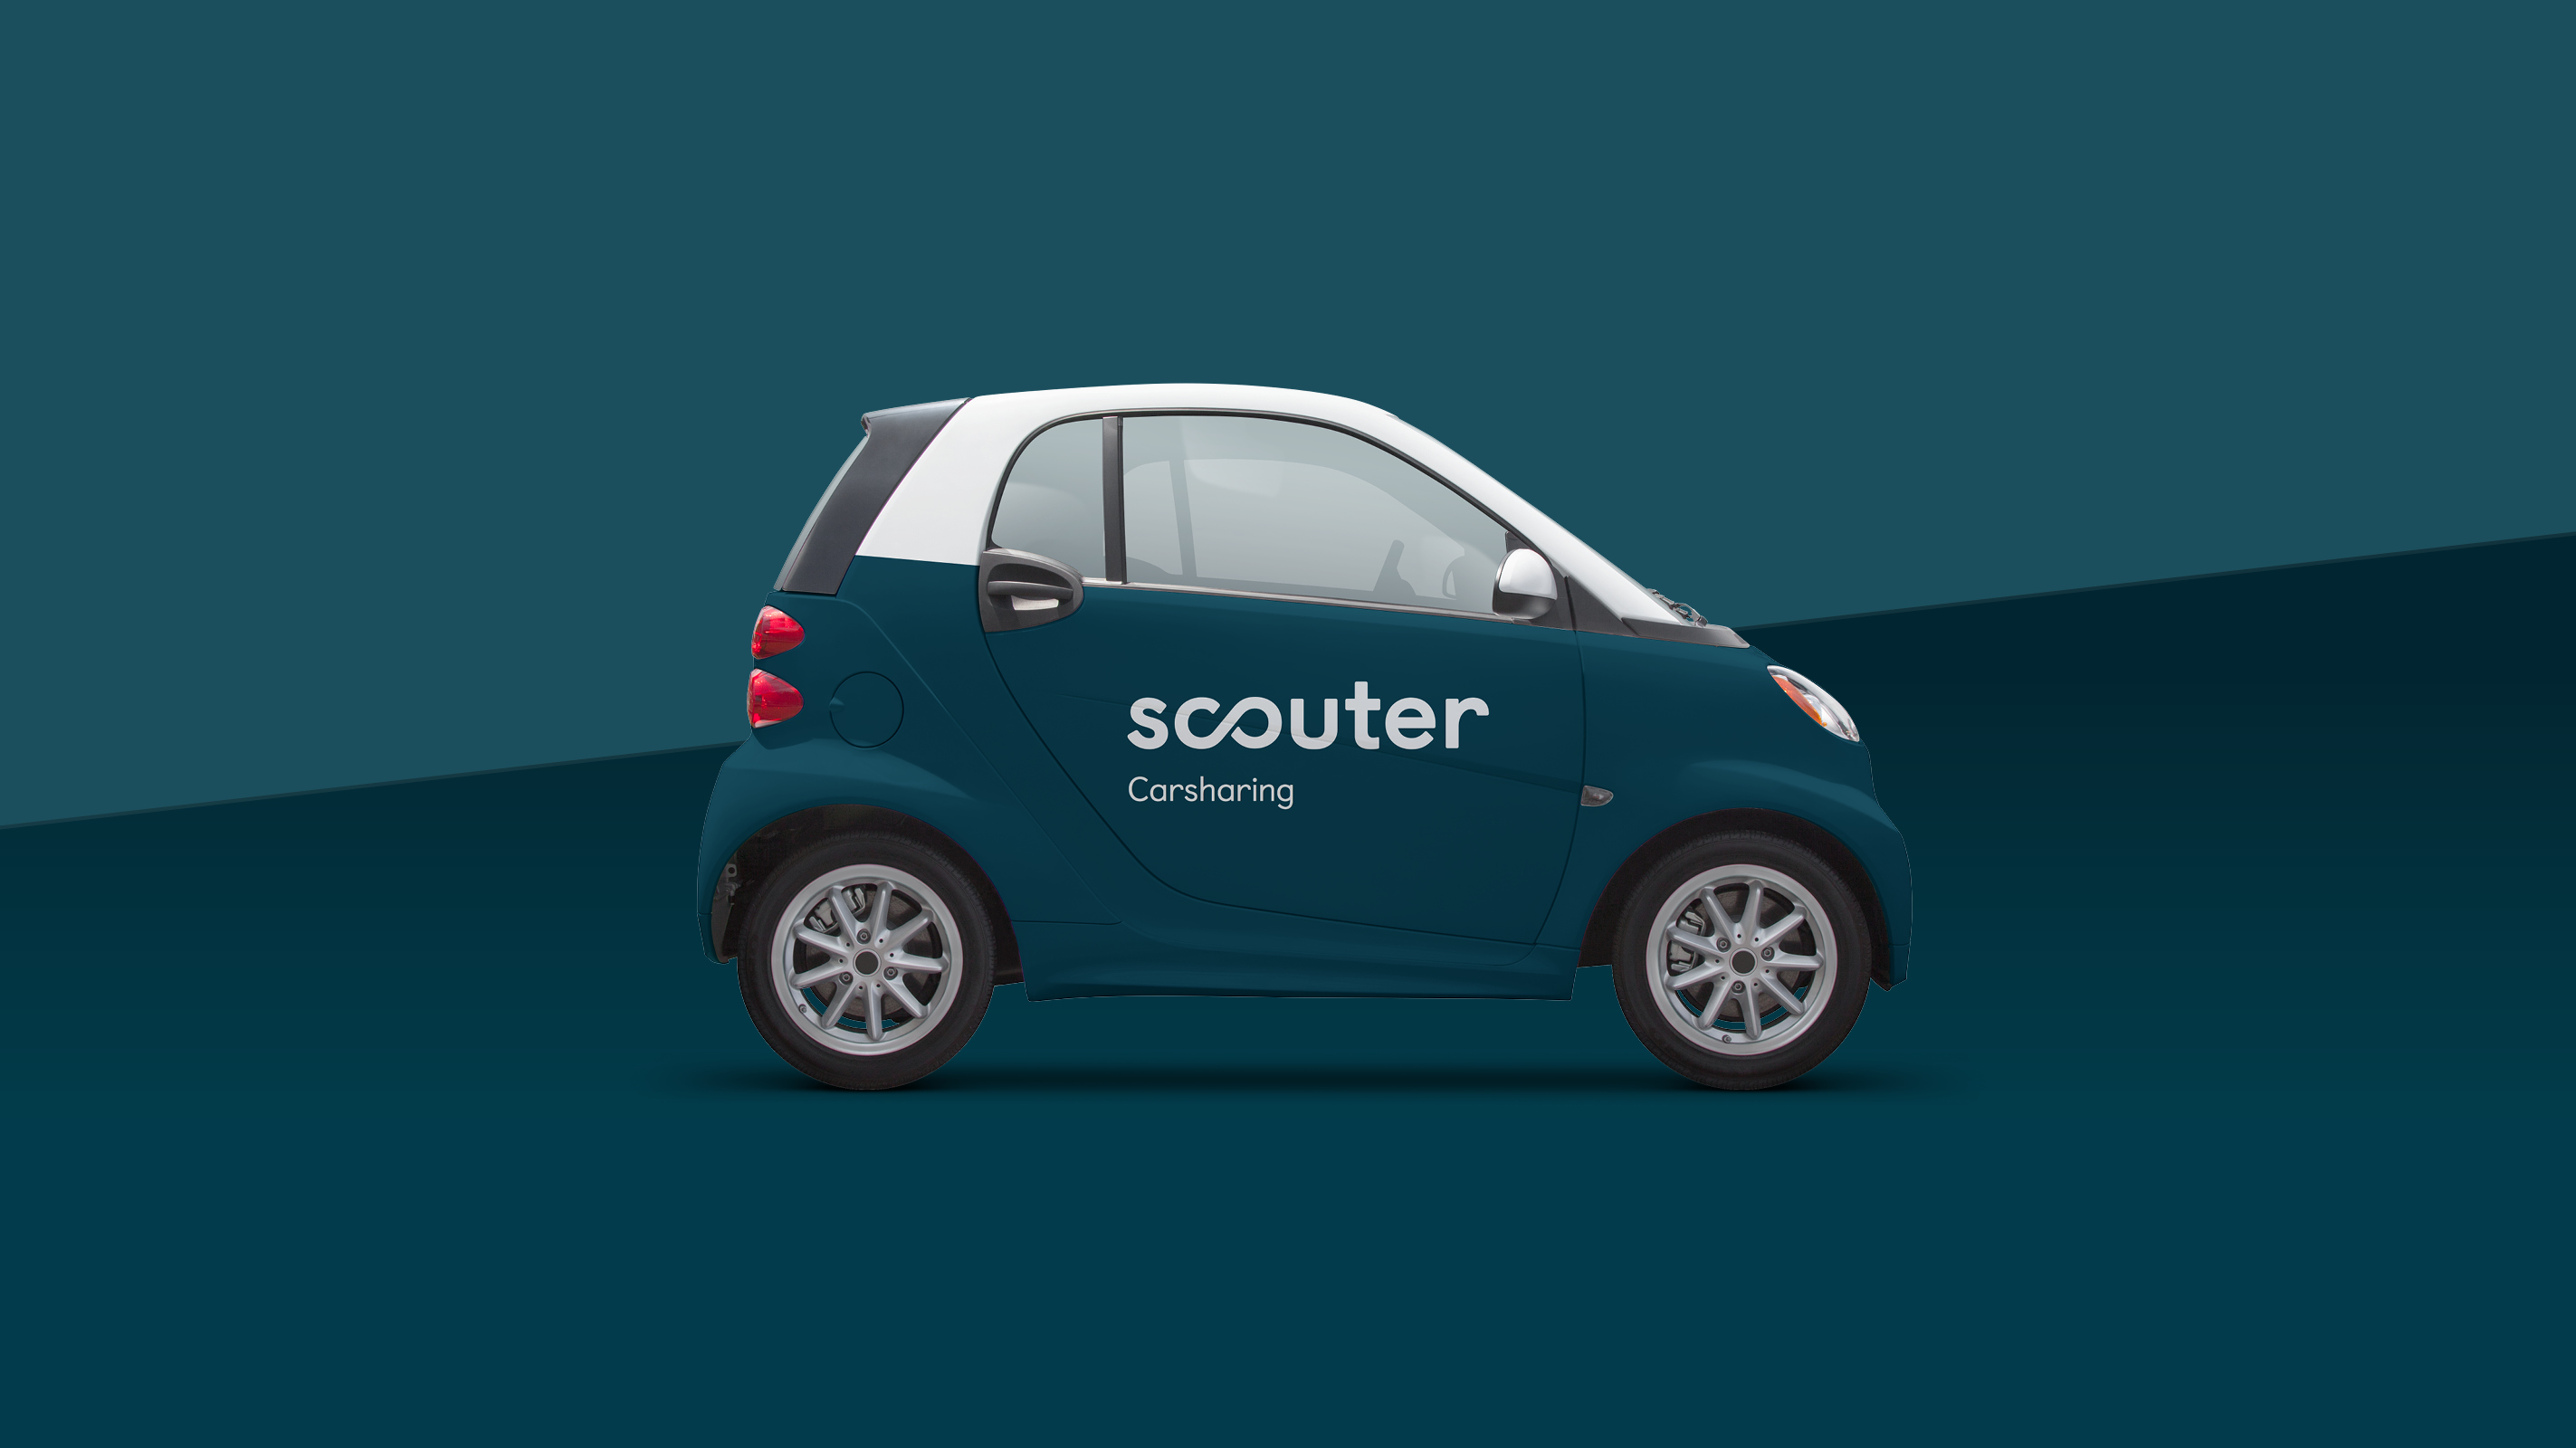 Scouter Carsharing – Poarangan Brand Design10